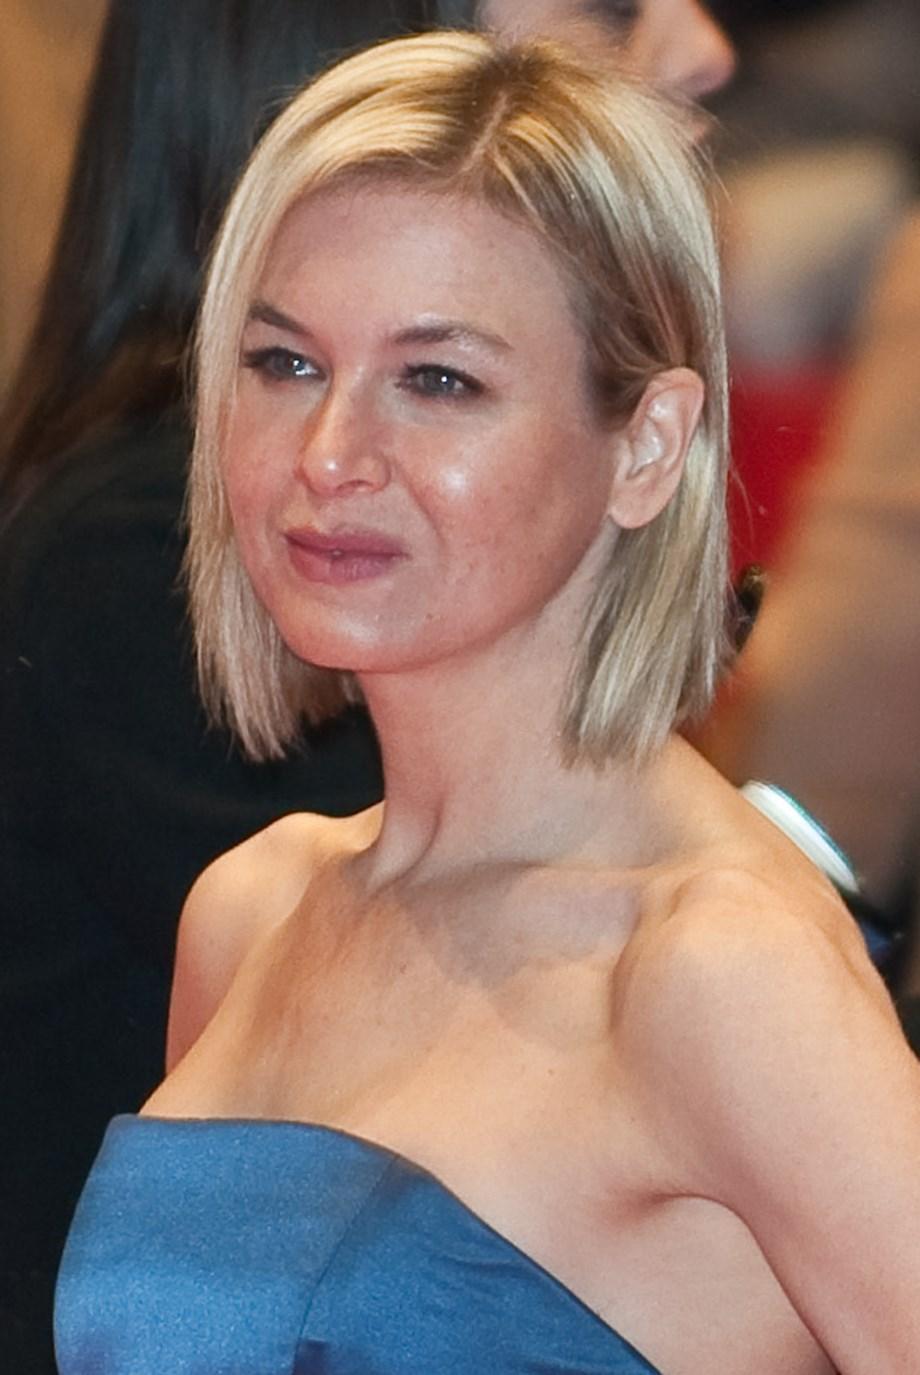 Entertainment News Roundup: 'Downton Abbey' cast feeling pressure ahead of movie; Renée Zellweger felt a 'sense of responsibility' in 'Judy'